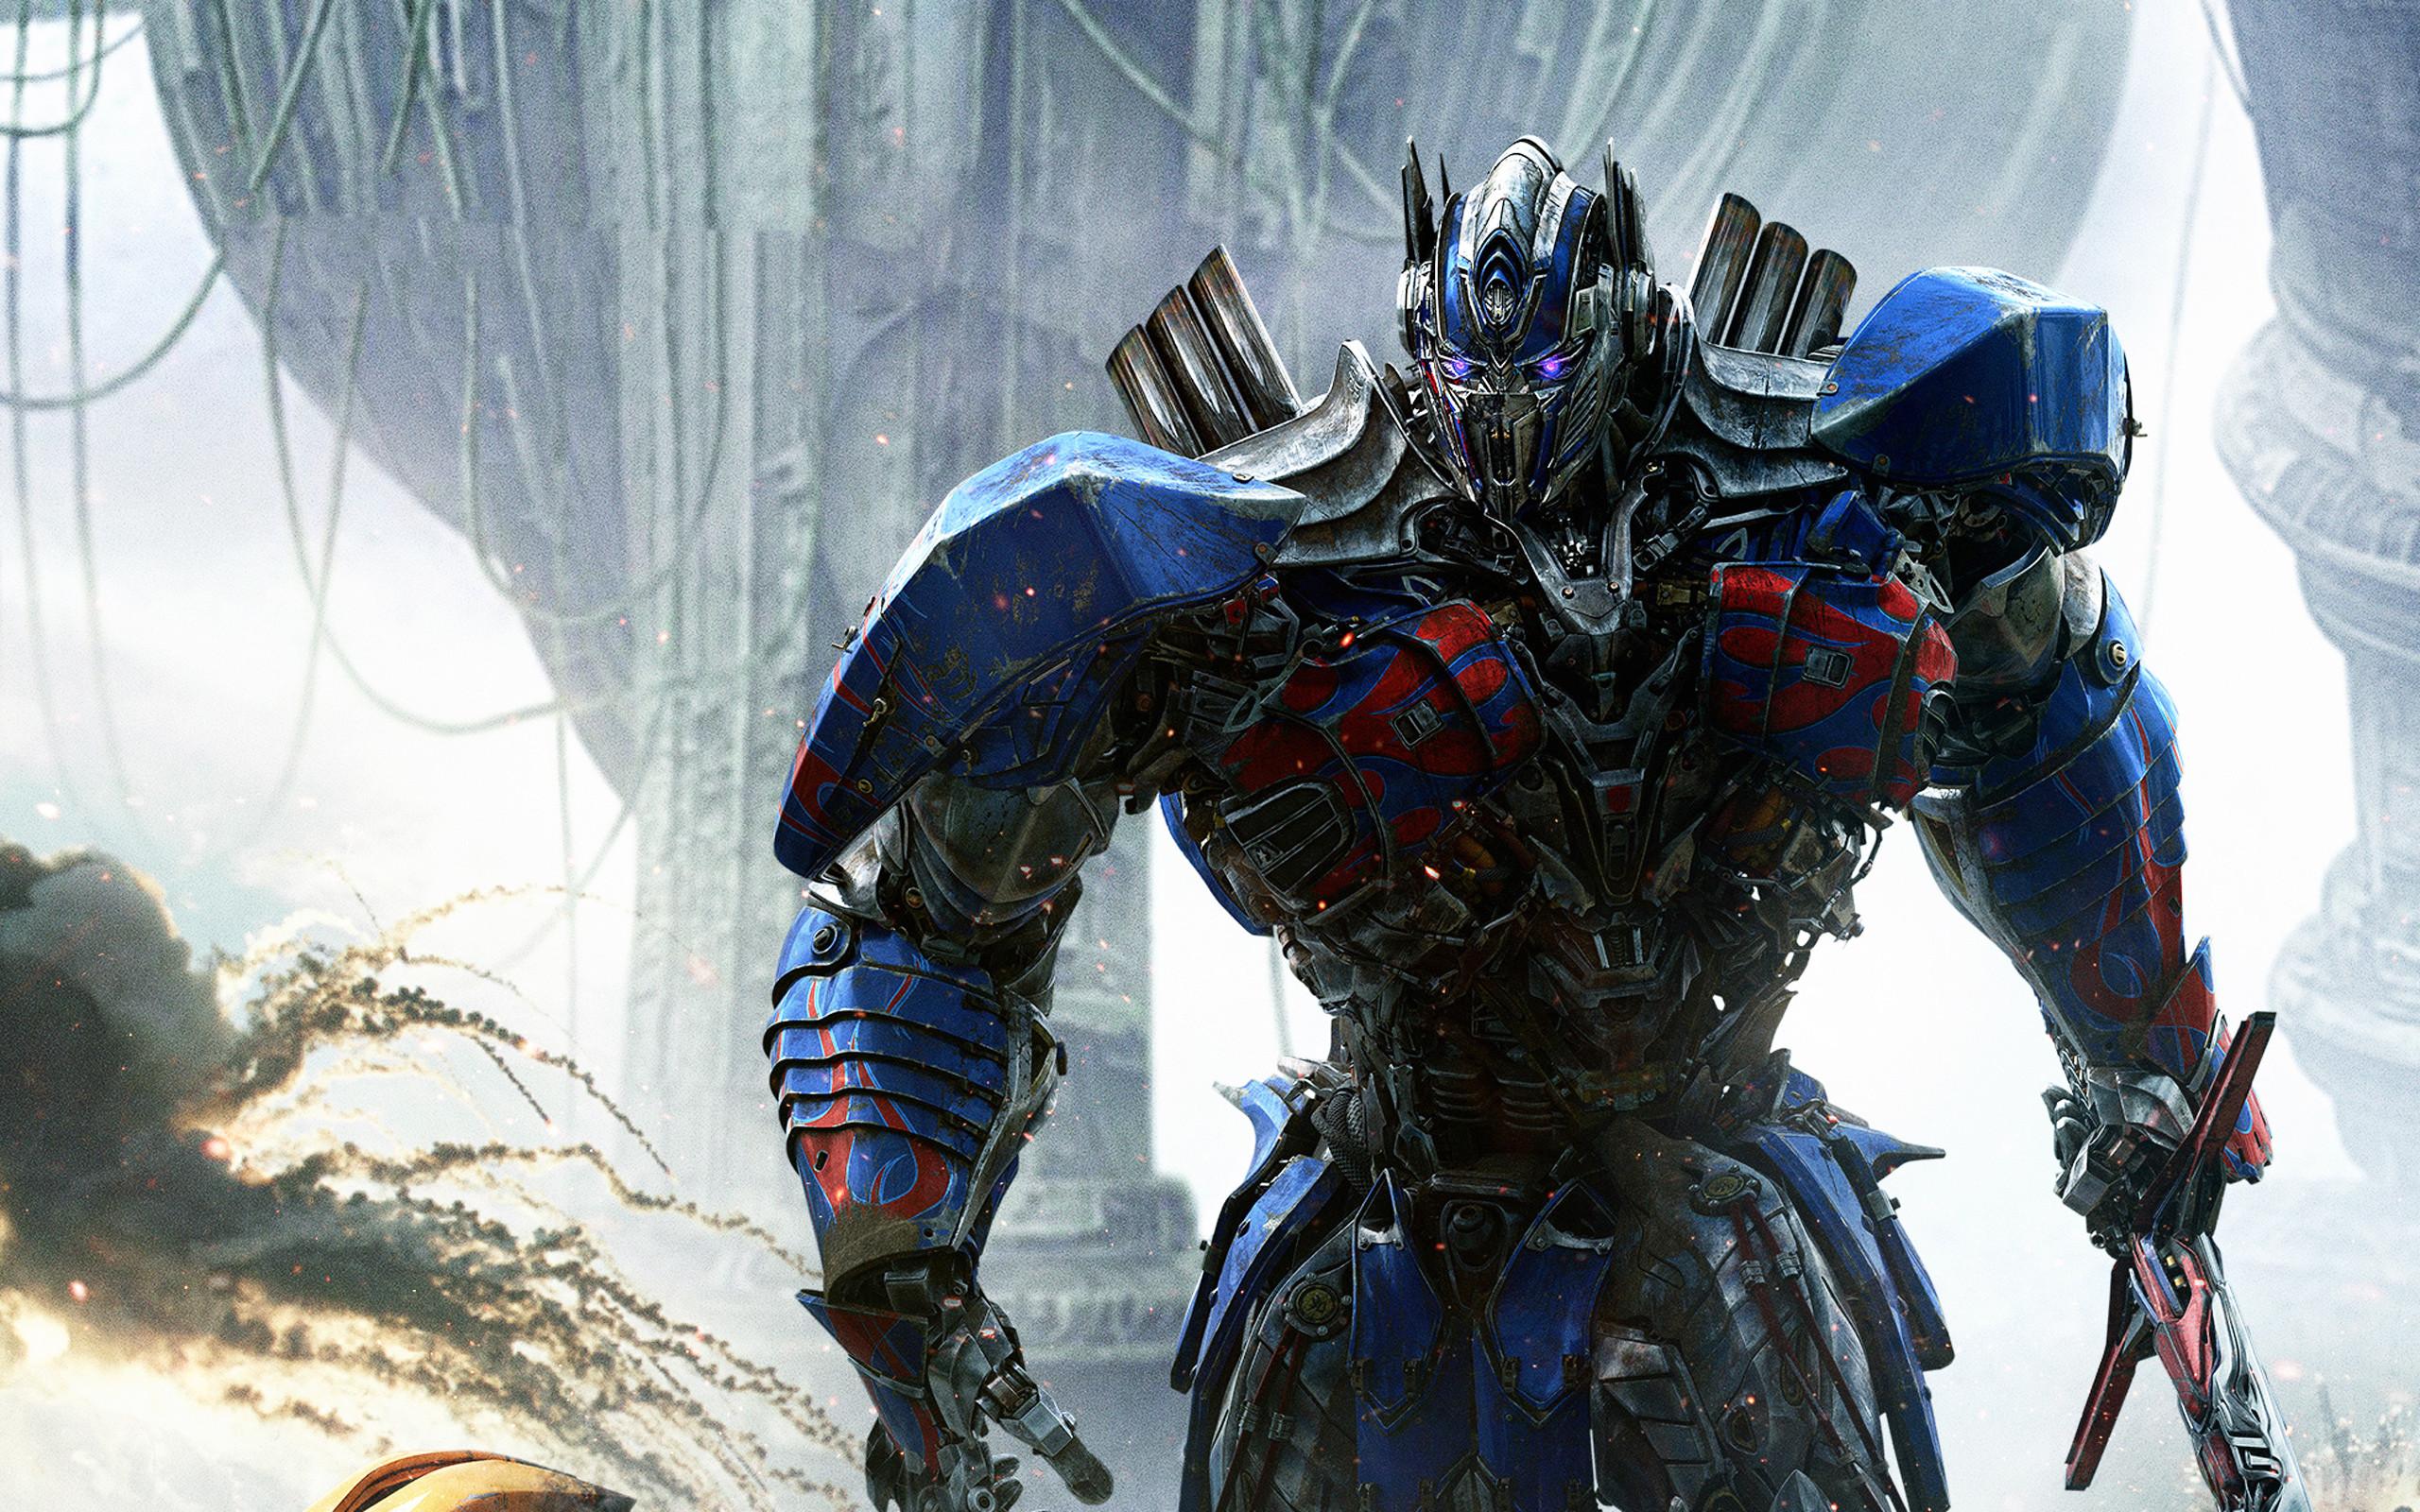 Optimus Prime Transformers The Last Knight Wallpaper - Optimus Prime The Last Knight - HD Wallpaper